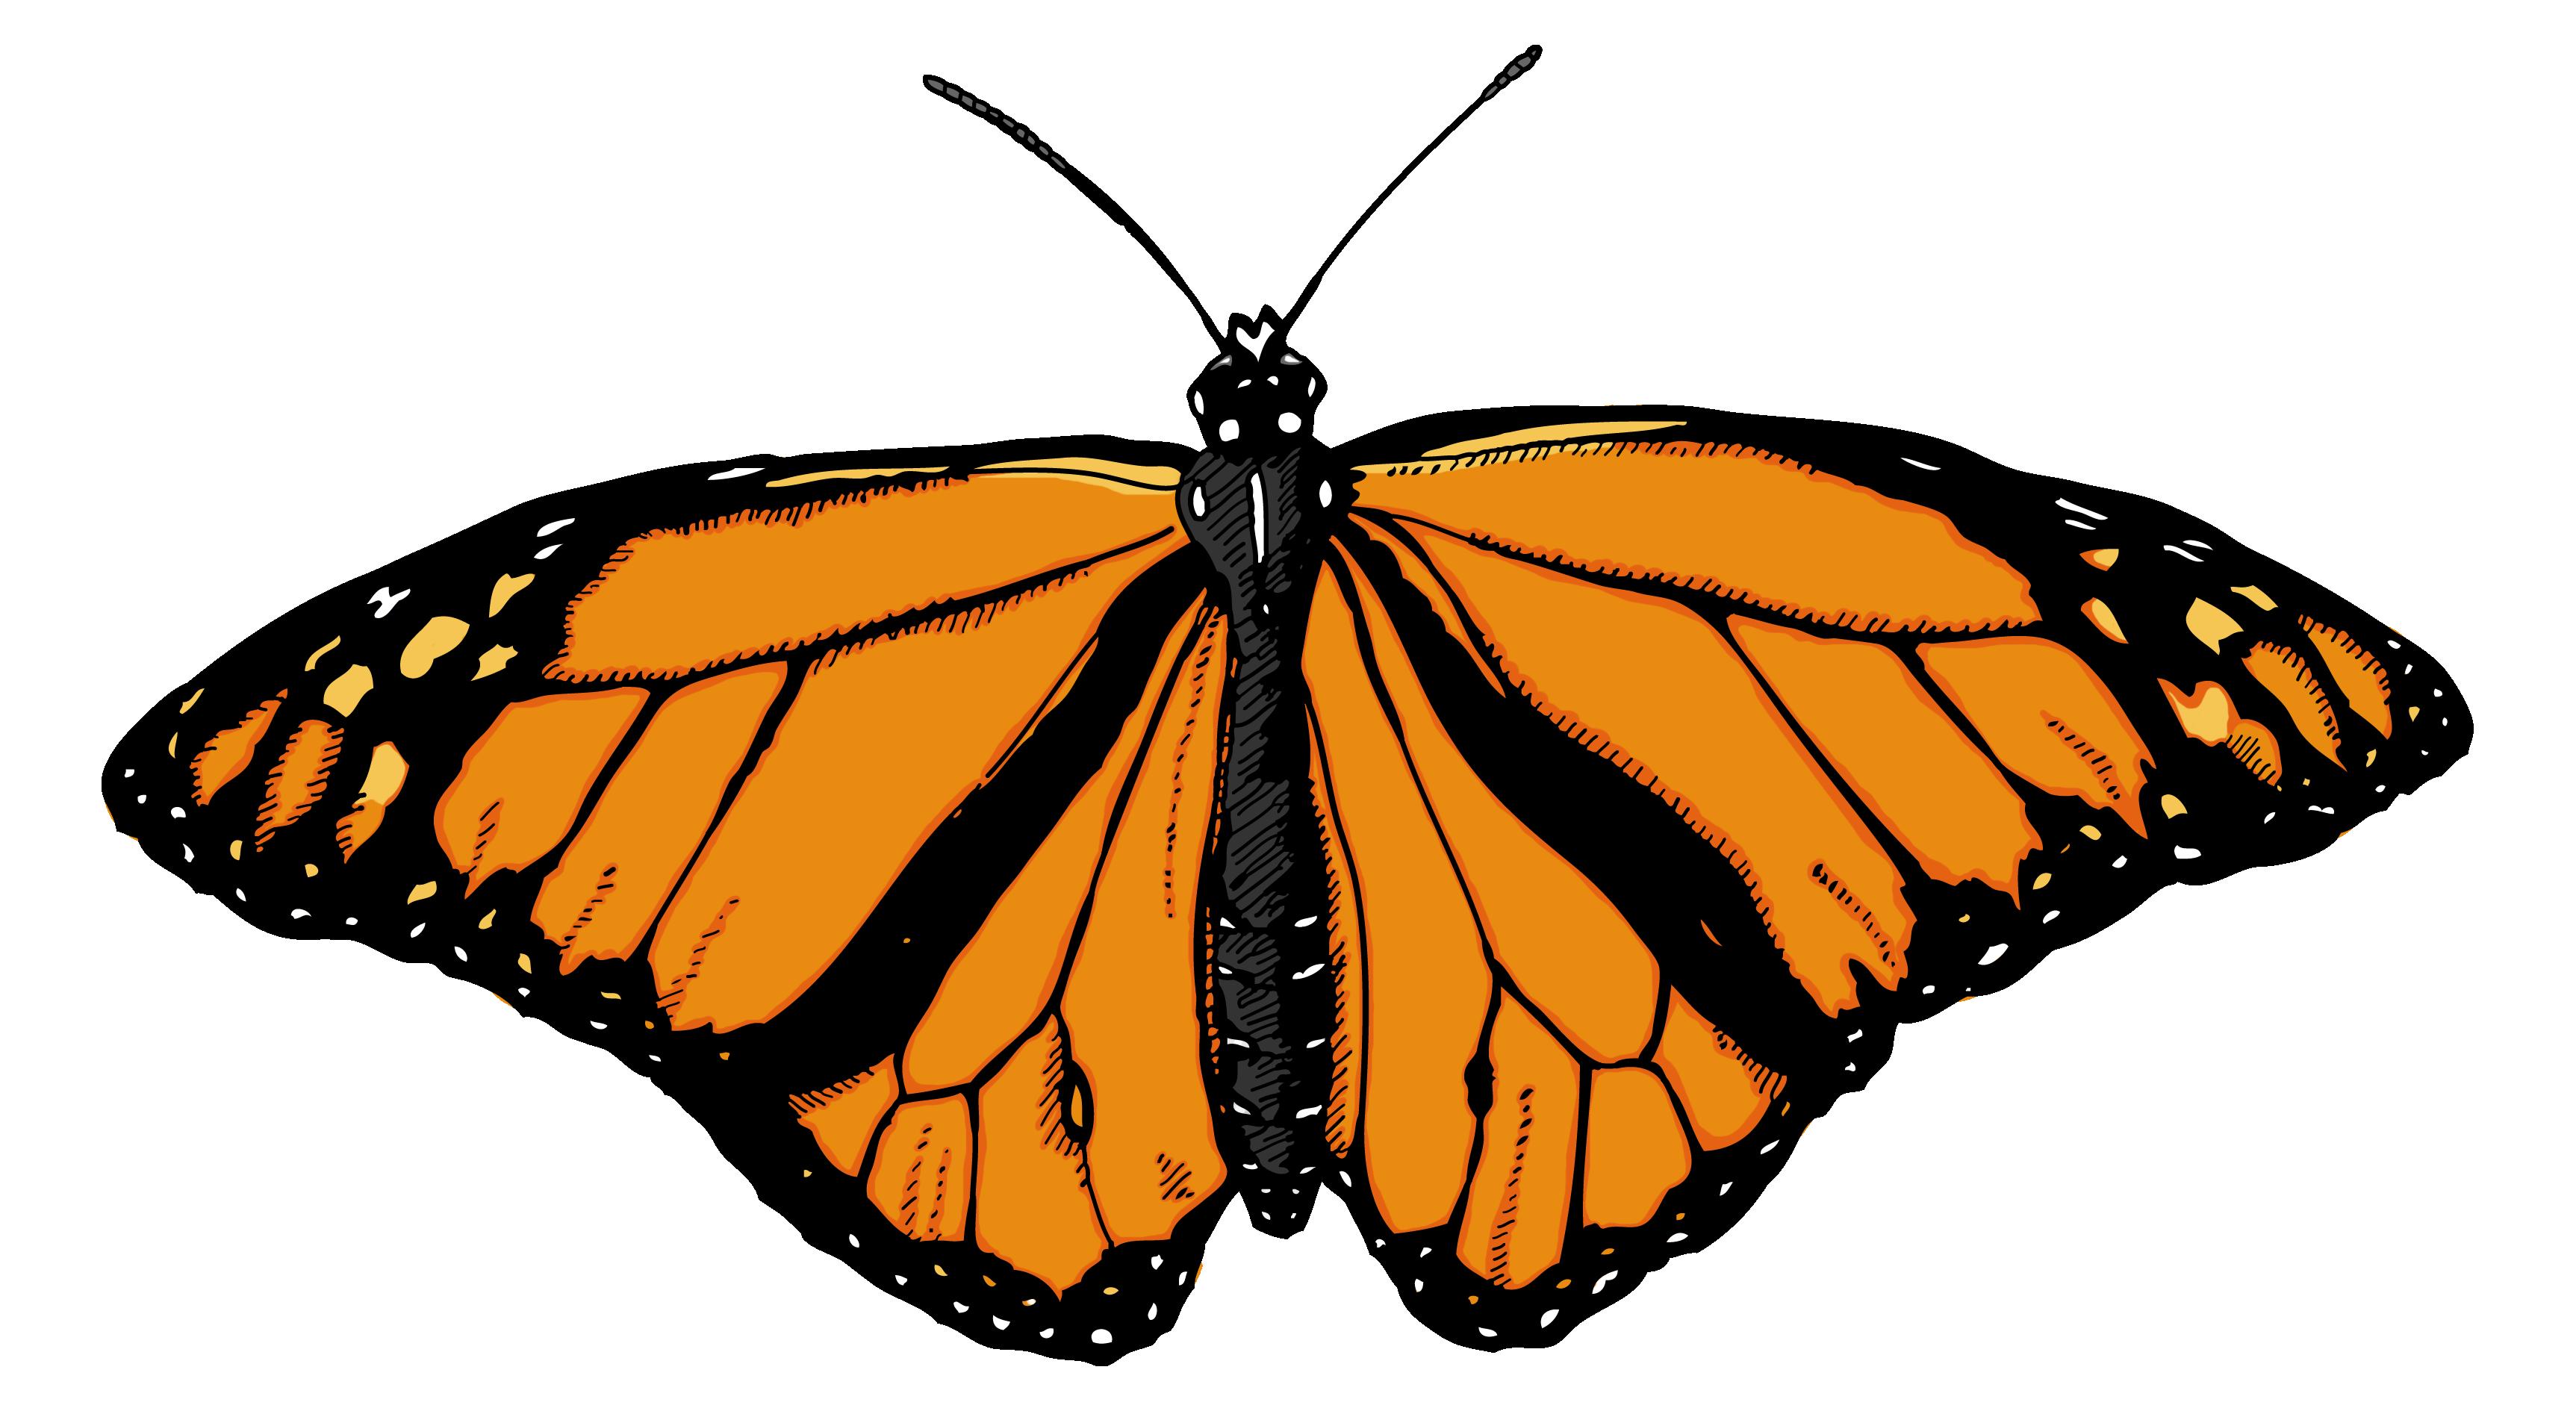 Butterfly Illustration Google Search Buy Art Print Butterfly Illustration Png Images